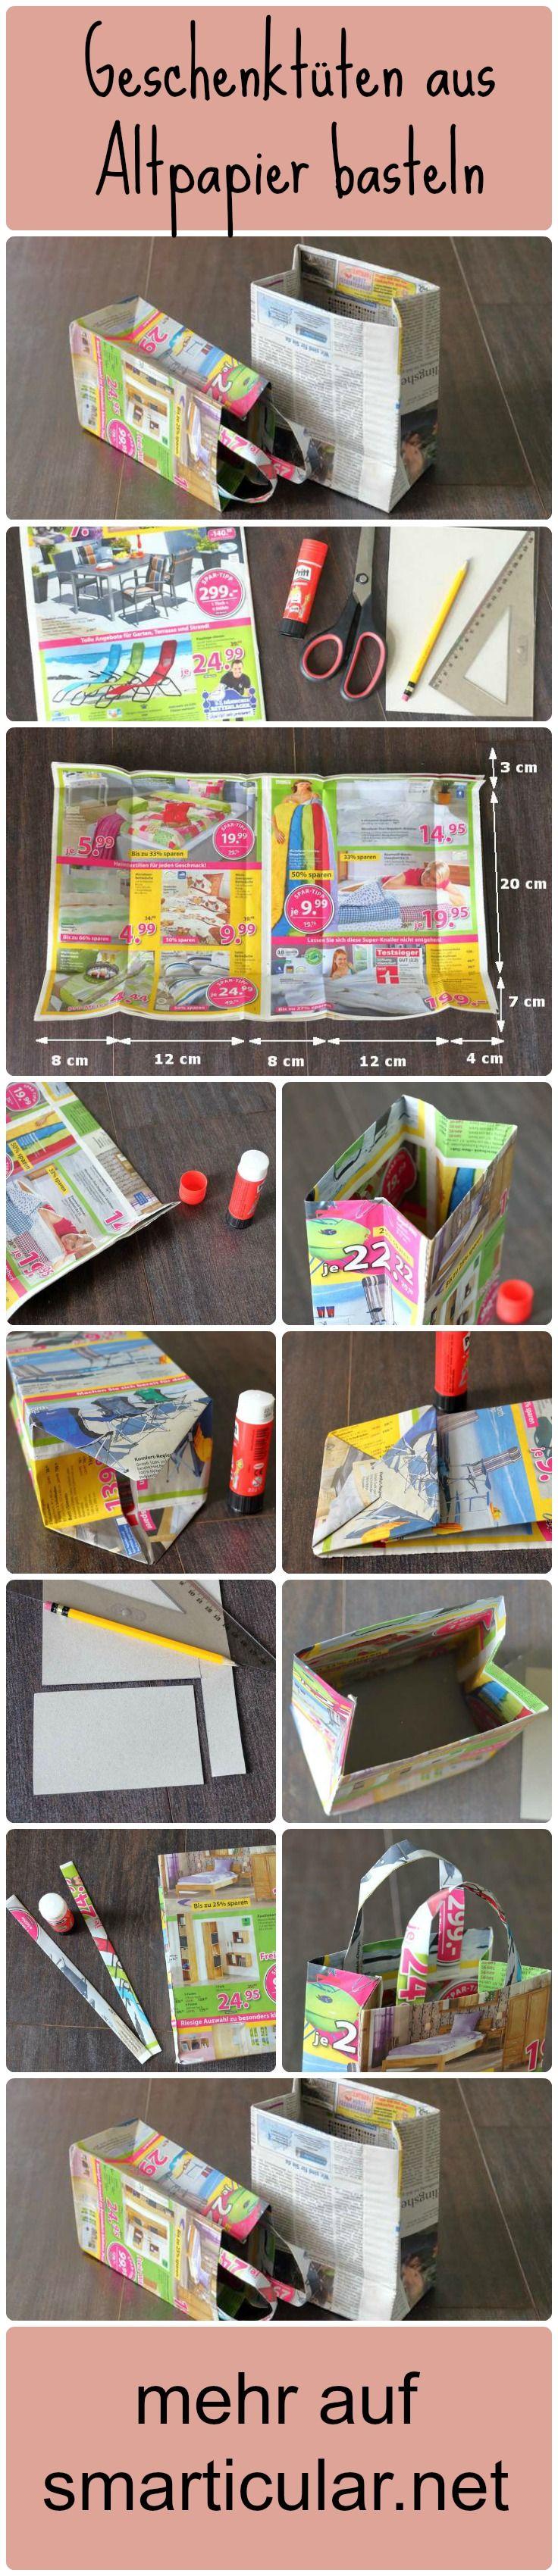 Geschenktüten aus Altpapier